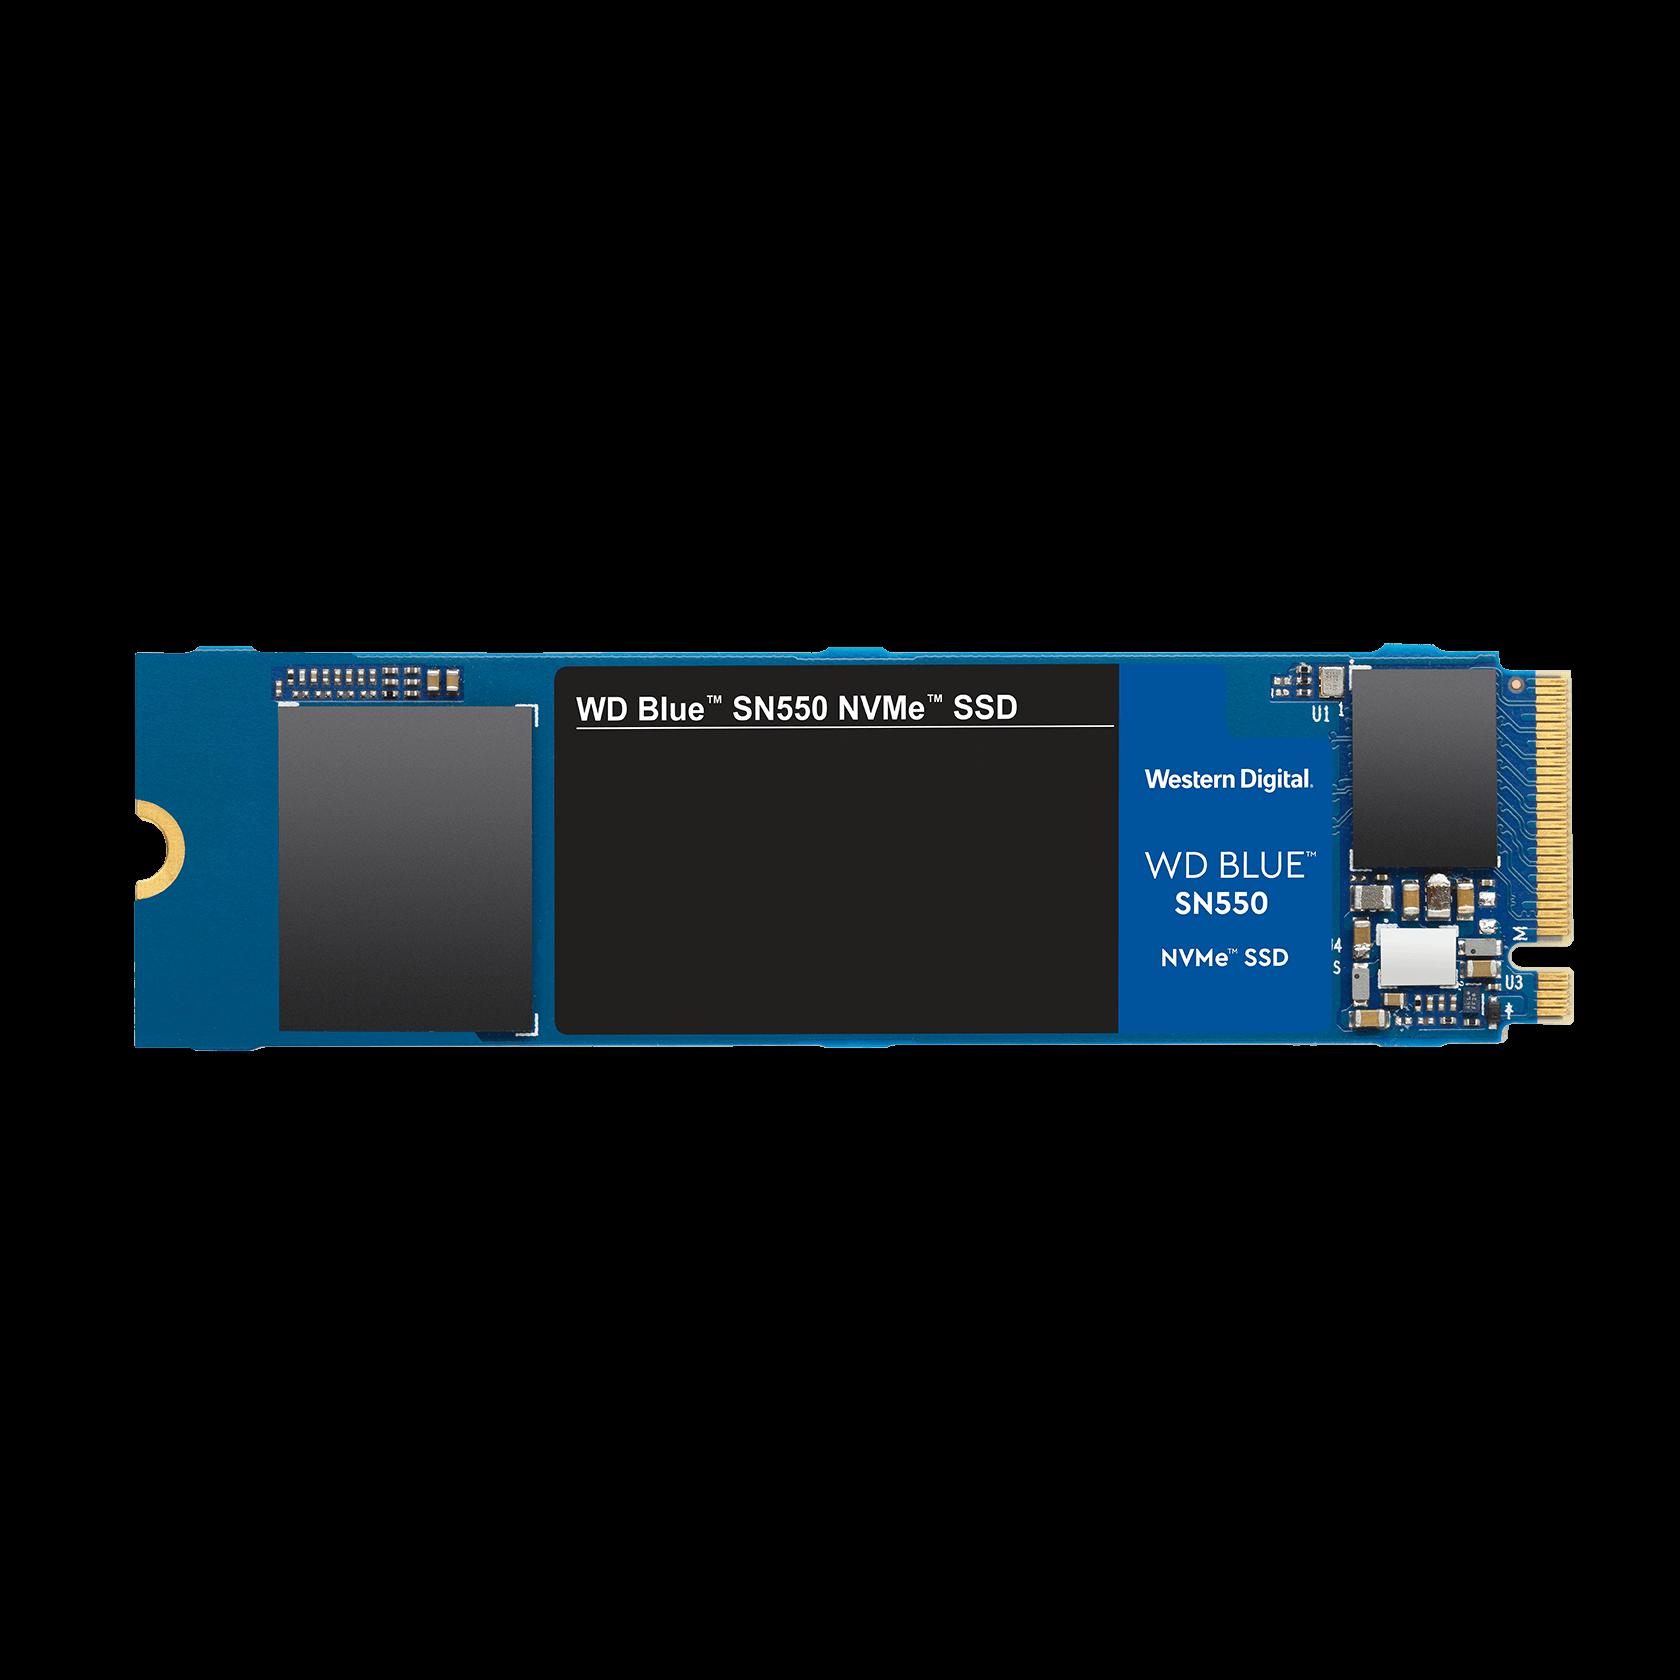 WD Blue SN550 M.2 NVMe SSD 1TB $116.99 (or less) + FS @ wd.com